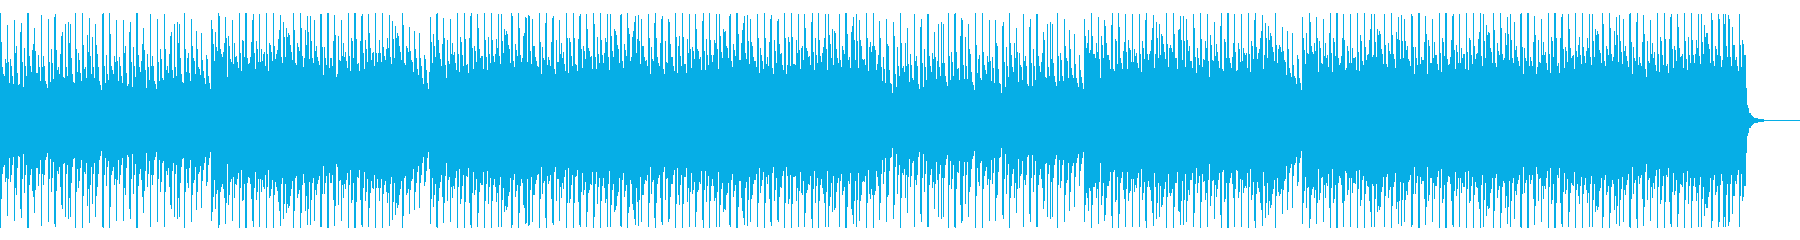 No strings Tetsukoto WIND Refreshing's reproduced waveform